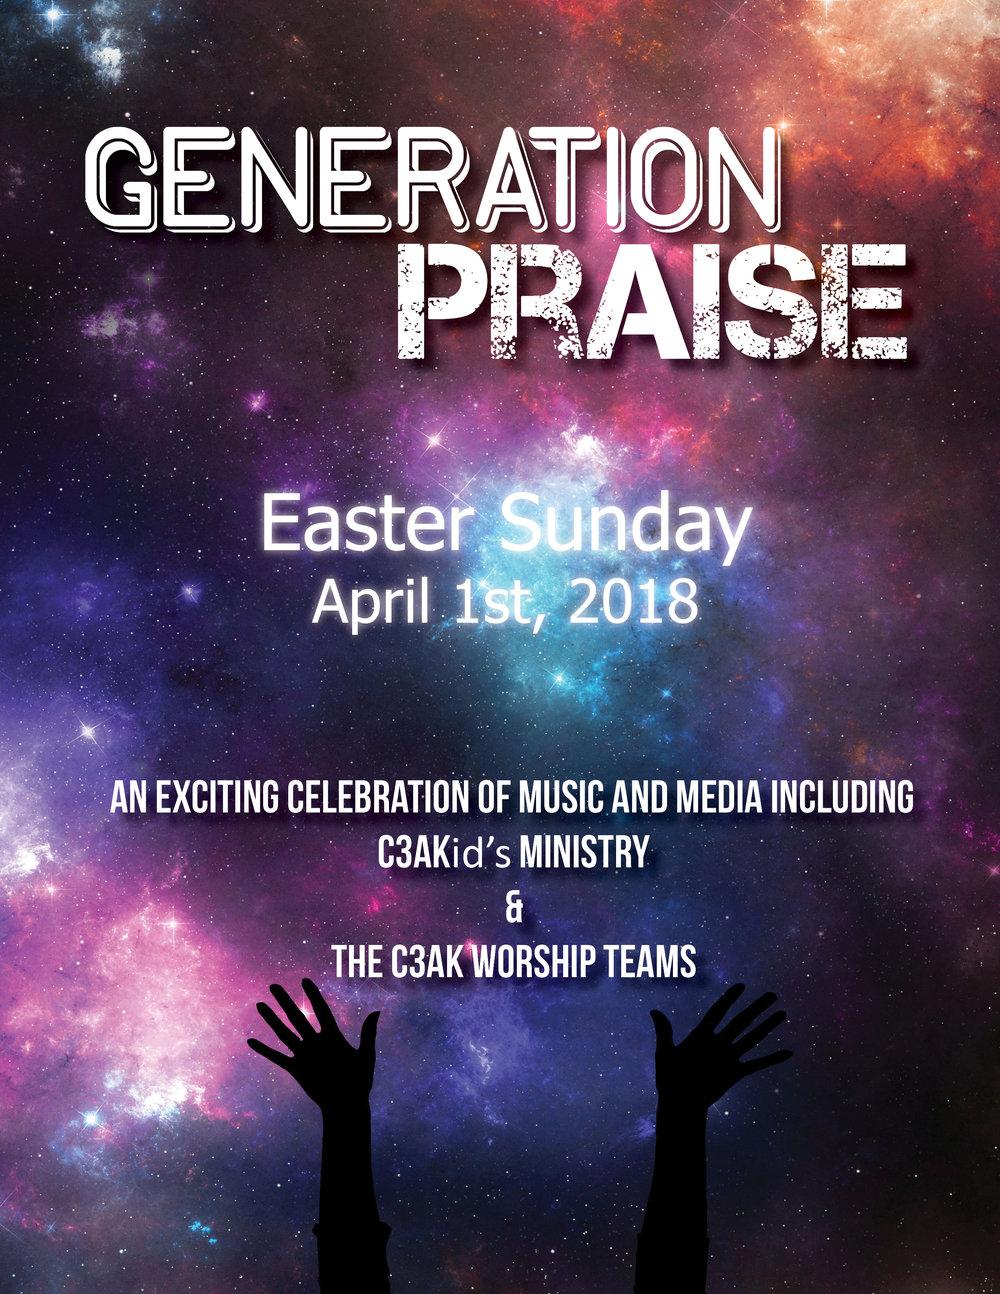 generation praise.jpg